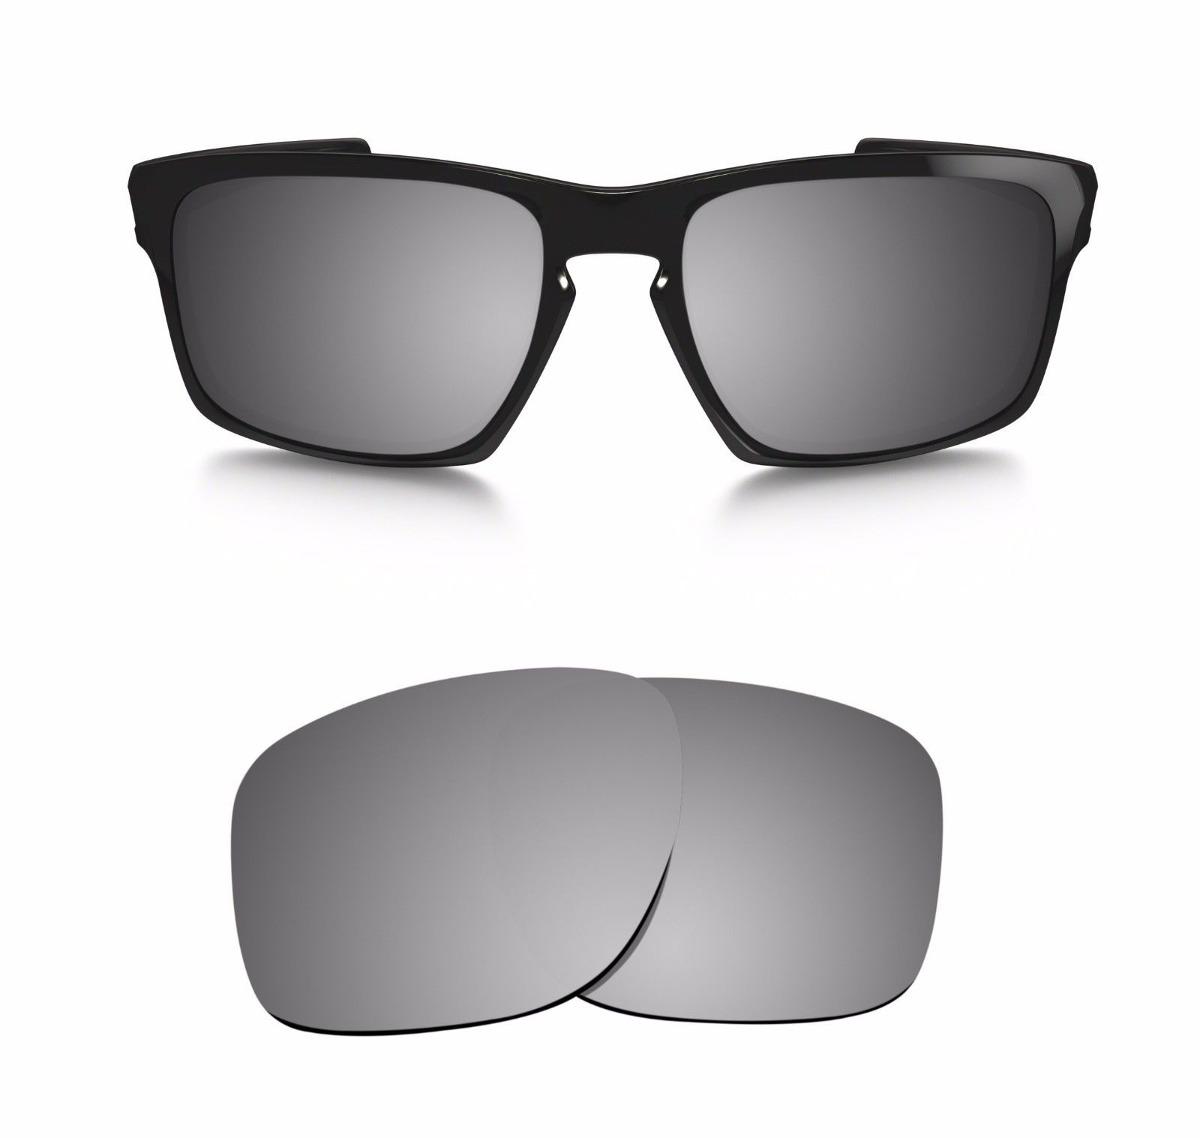 Nuevo Reemplazo Polarizado Lentes Oakley... (titanium) - $ 41.990 en ...